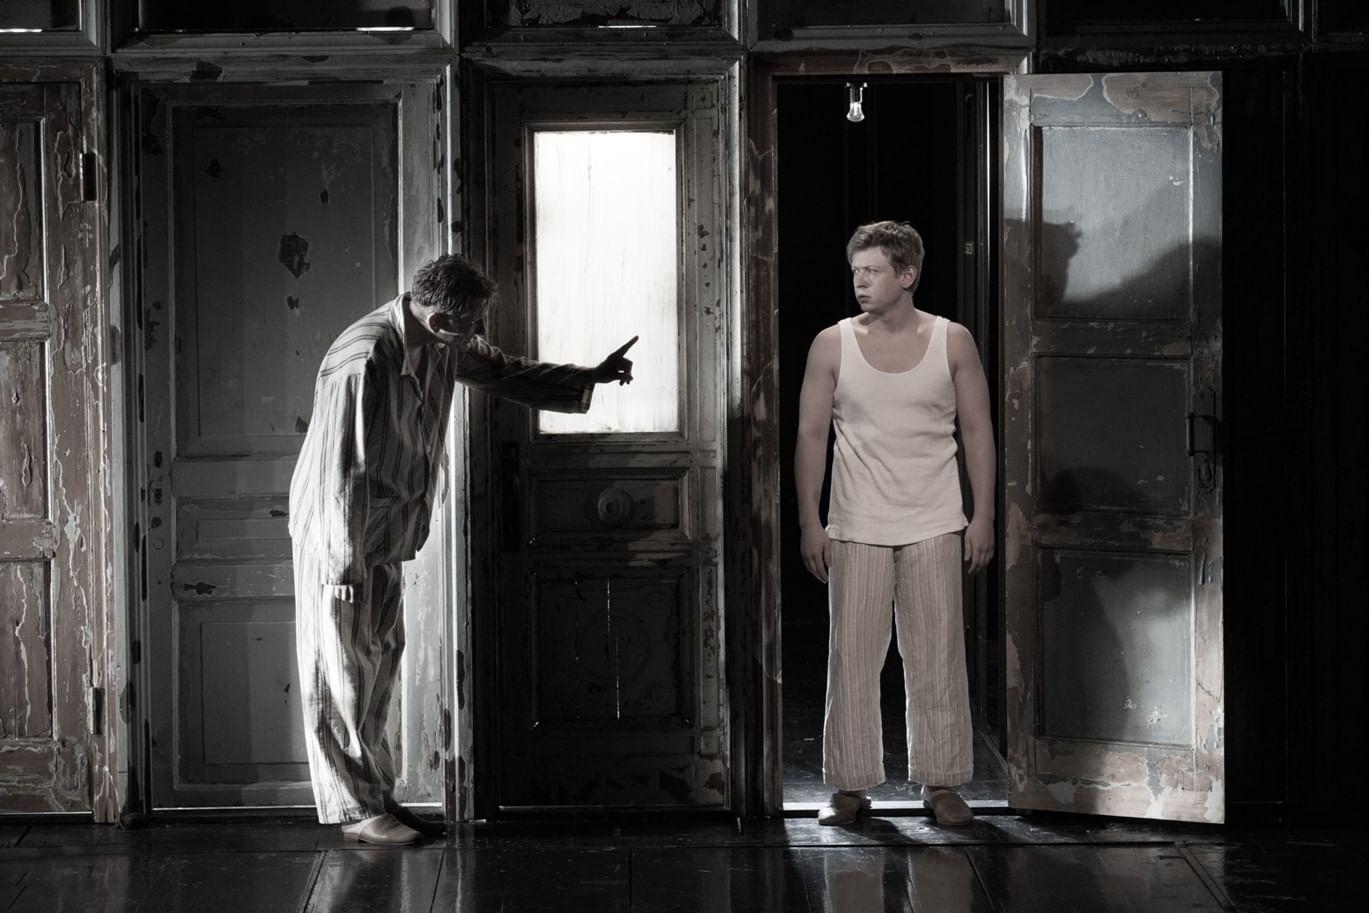 Сцена из спектакля «Самоубийца». Фотография: oppeople.ru